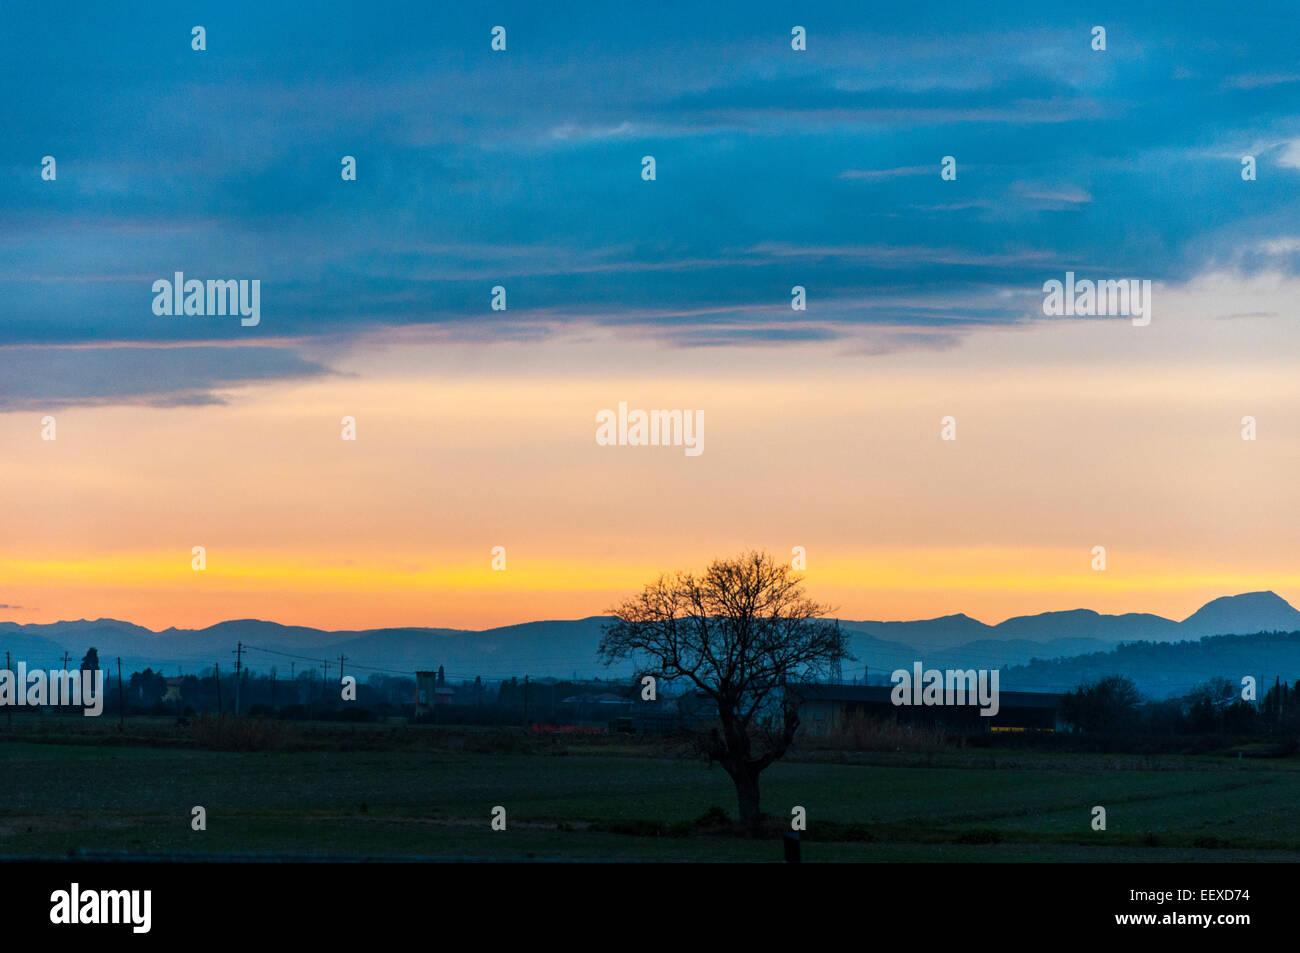 Tramonto marchigiano - Stock Image